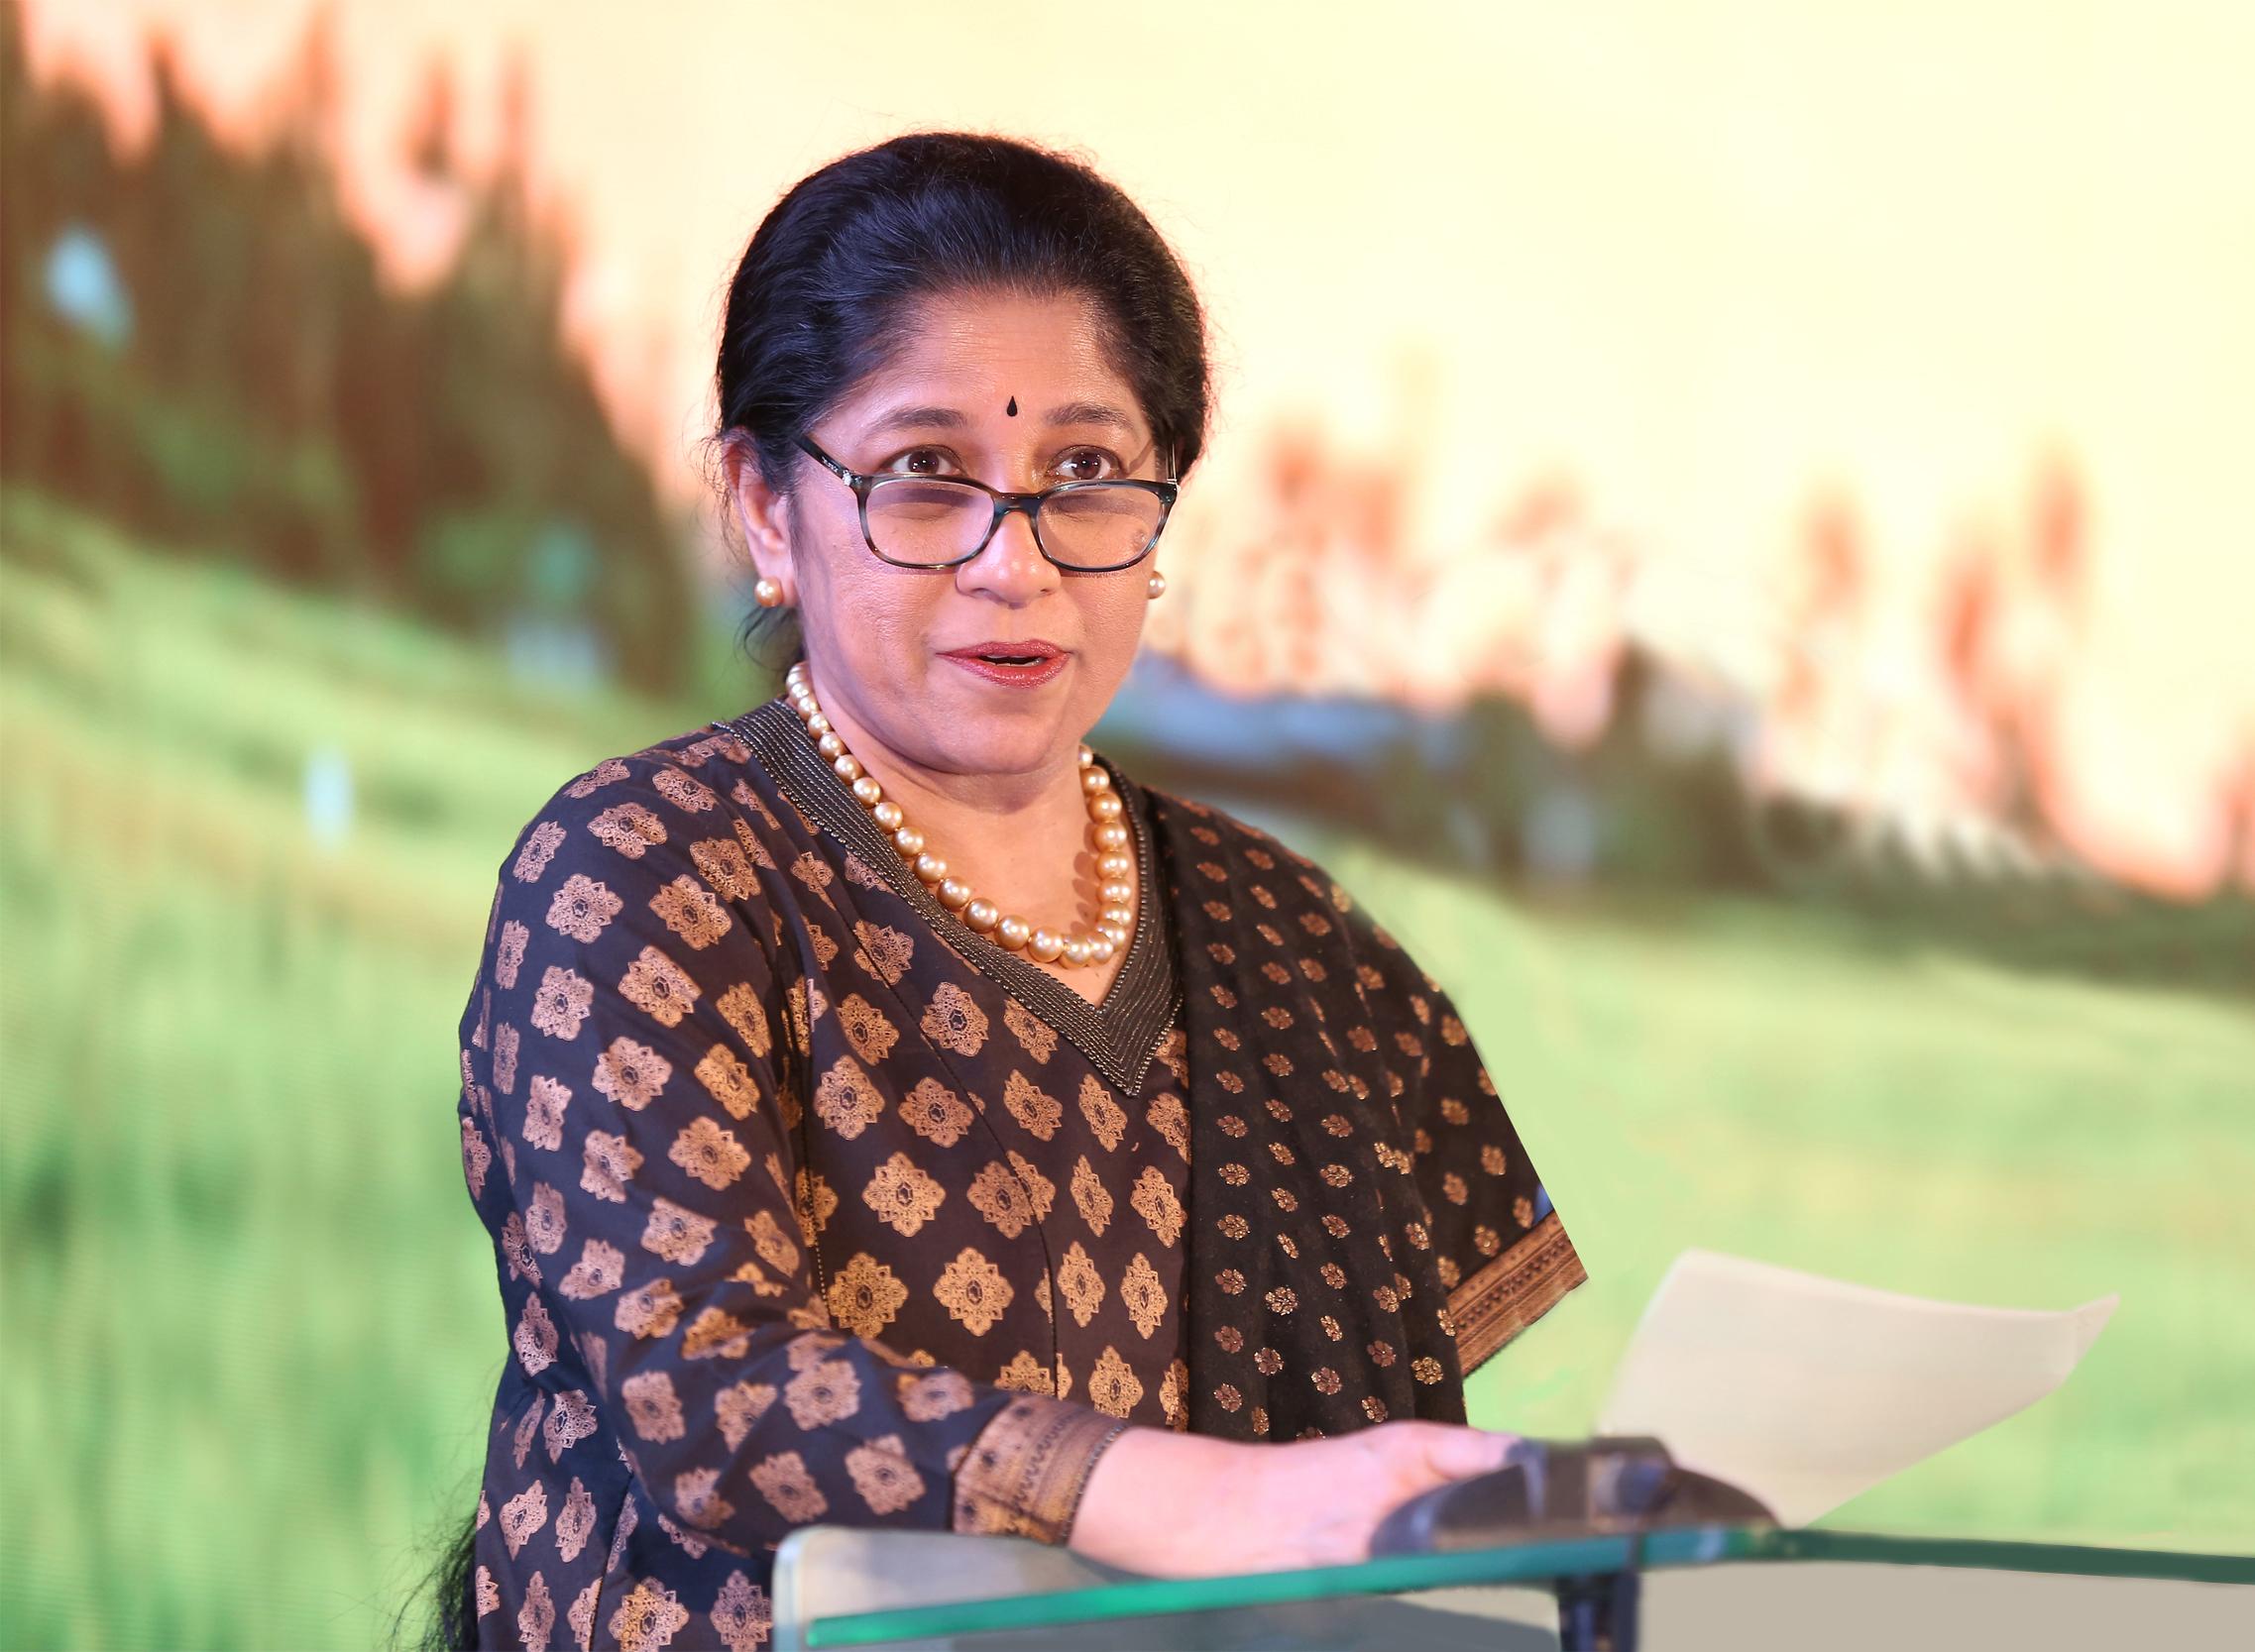 TAFE Chairman Mallika Srinivasan appointed to the Global Board of U.S.-India Business Council (USIBC)